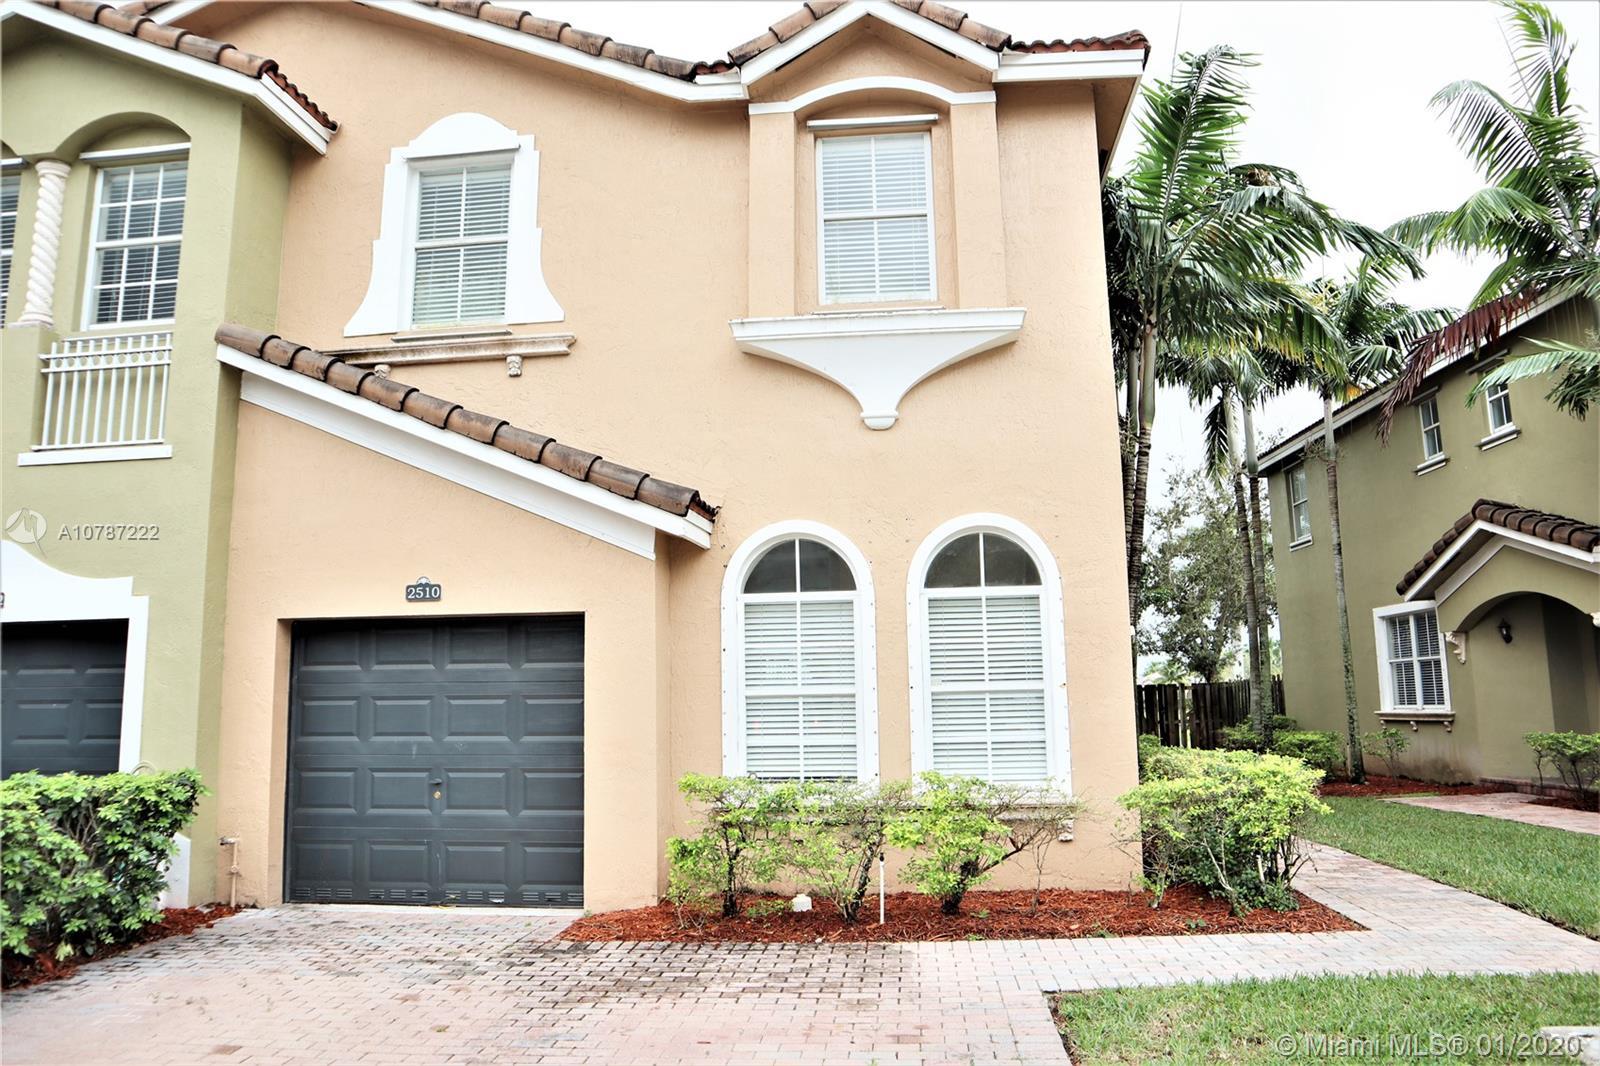 2510 SE 15th Ct, Homestead, FL 33035 - Homestead, FL real estate listing